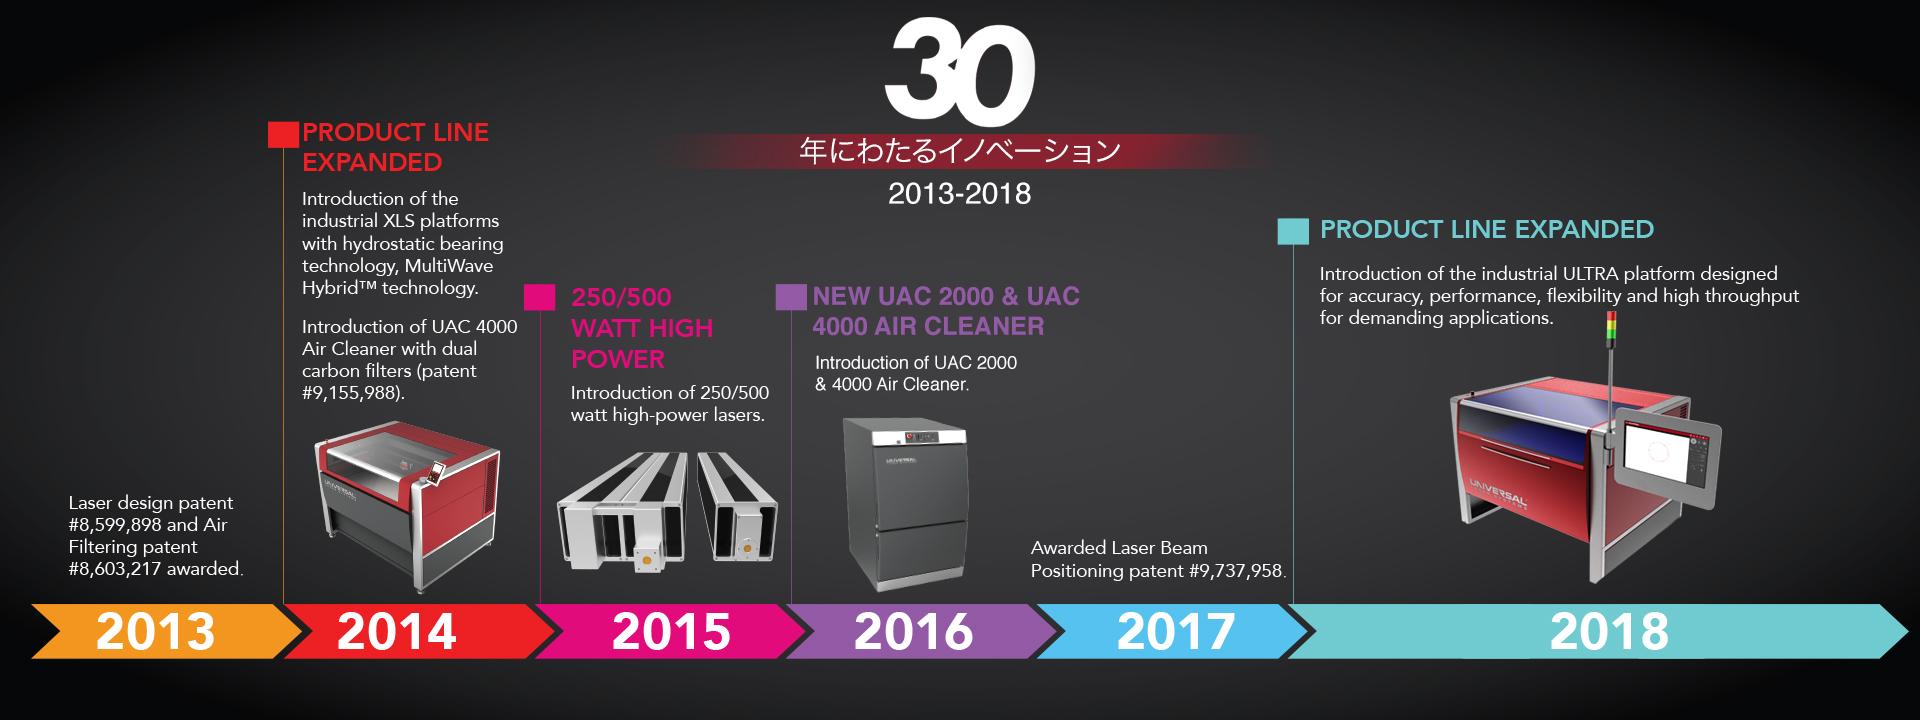 ULS Japanese Timeline 4